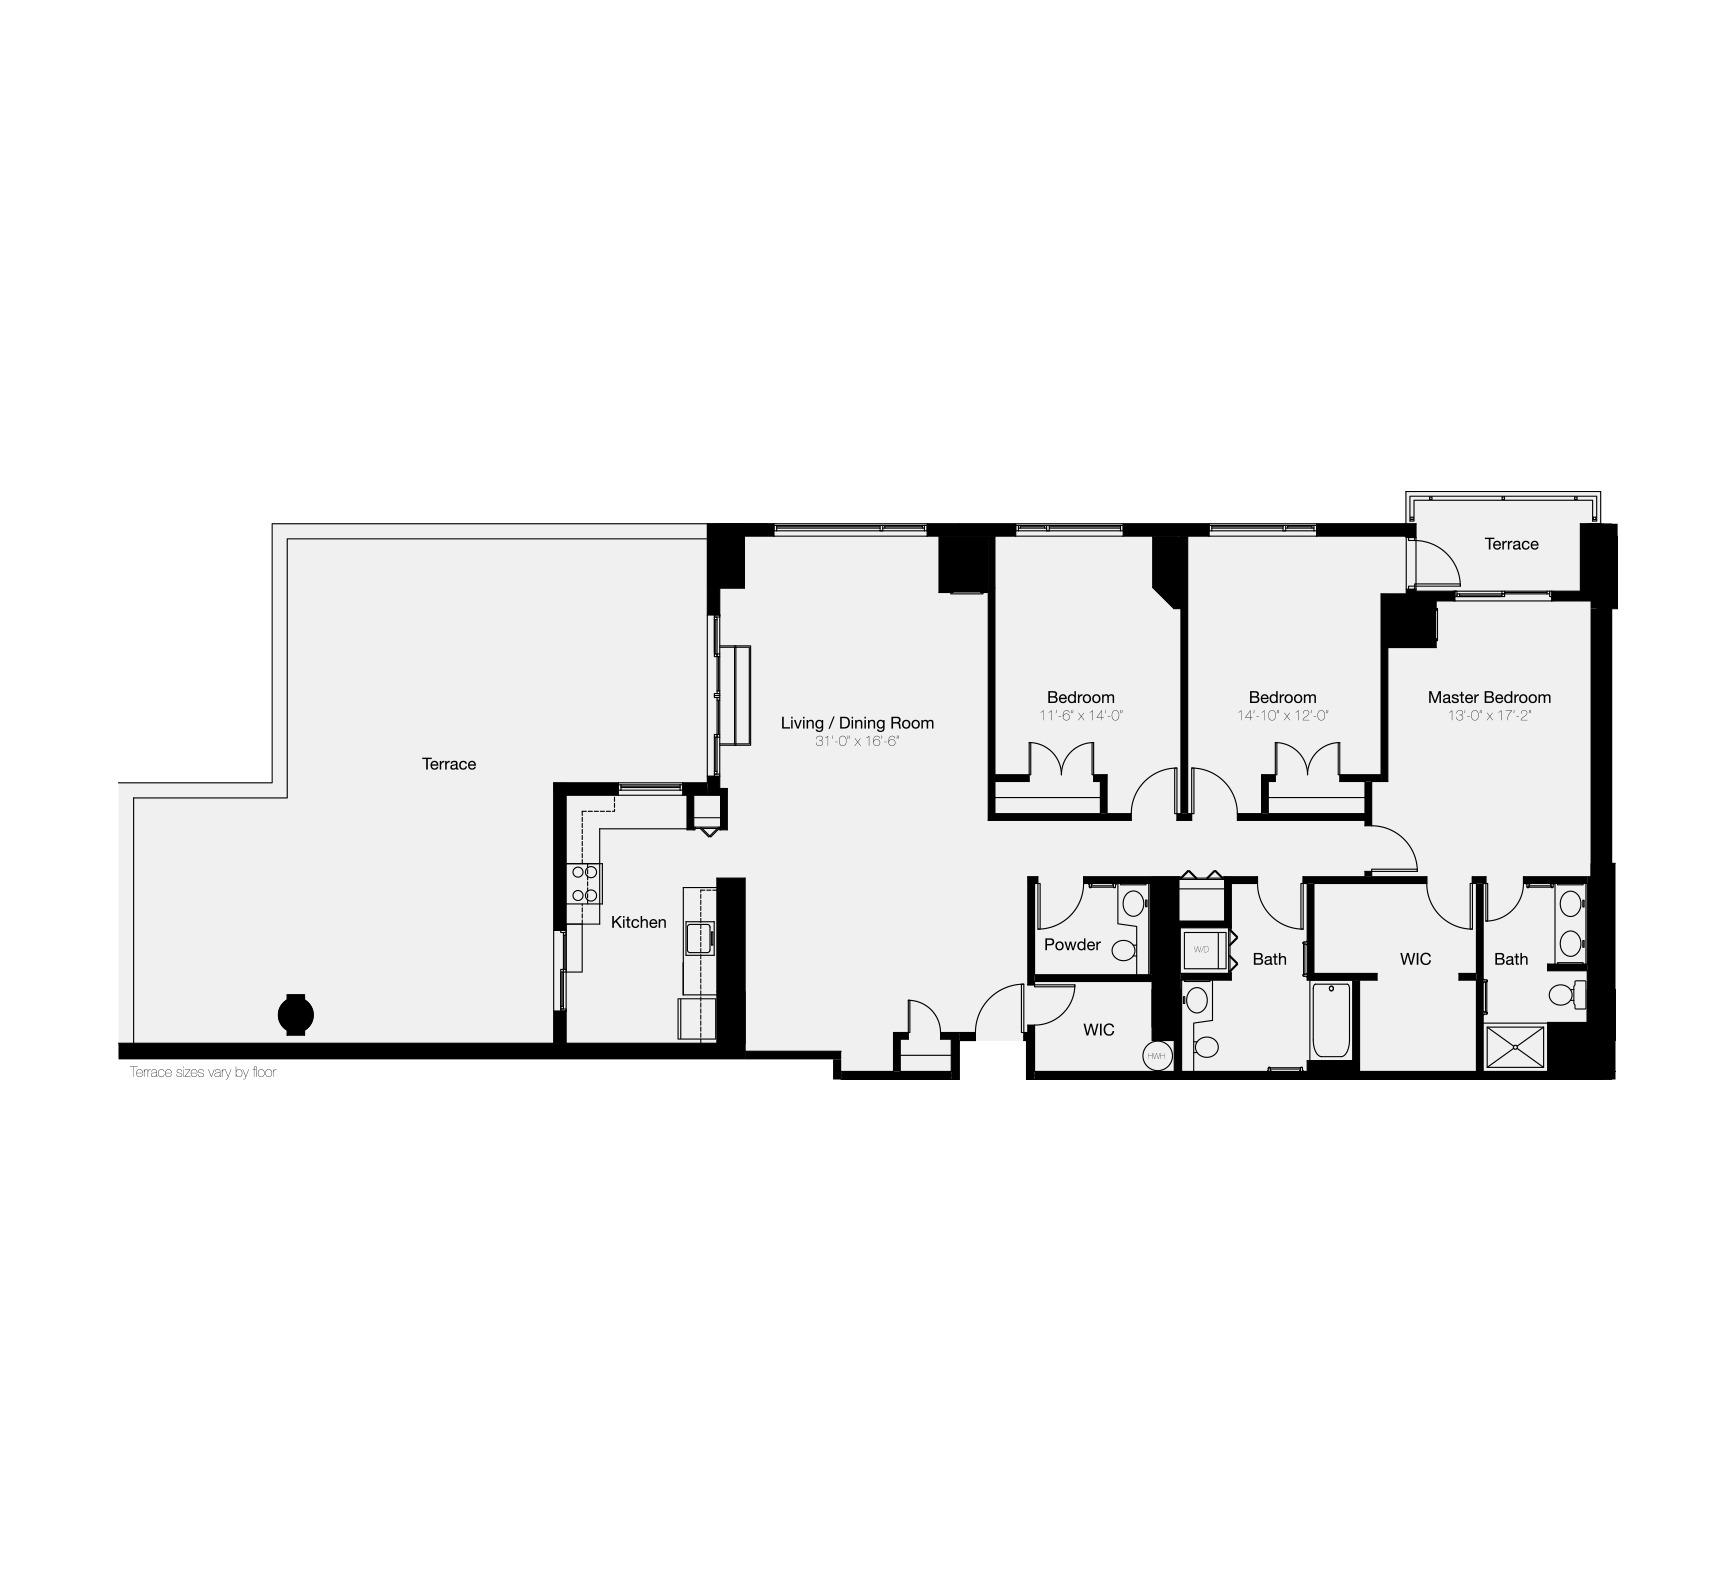 The Residences of Dockside three-bedroom floor plan